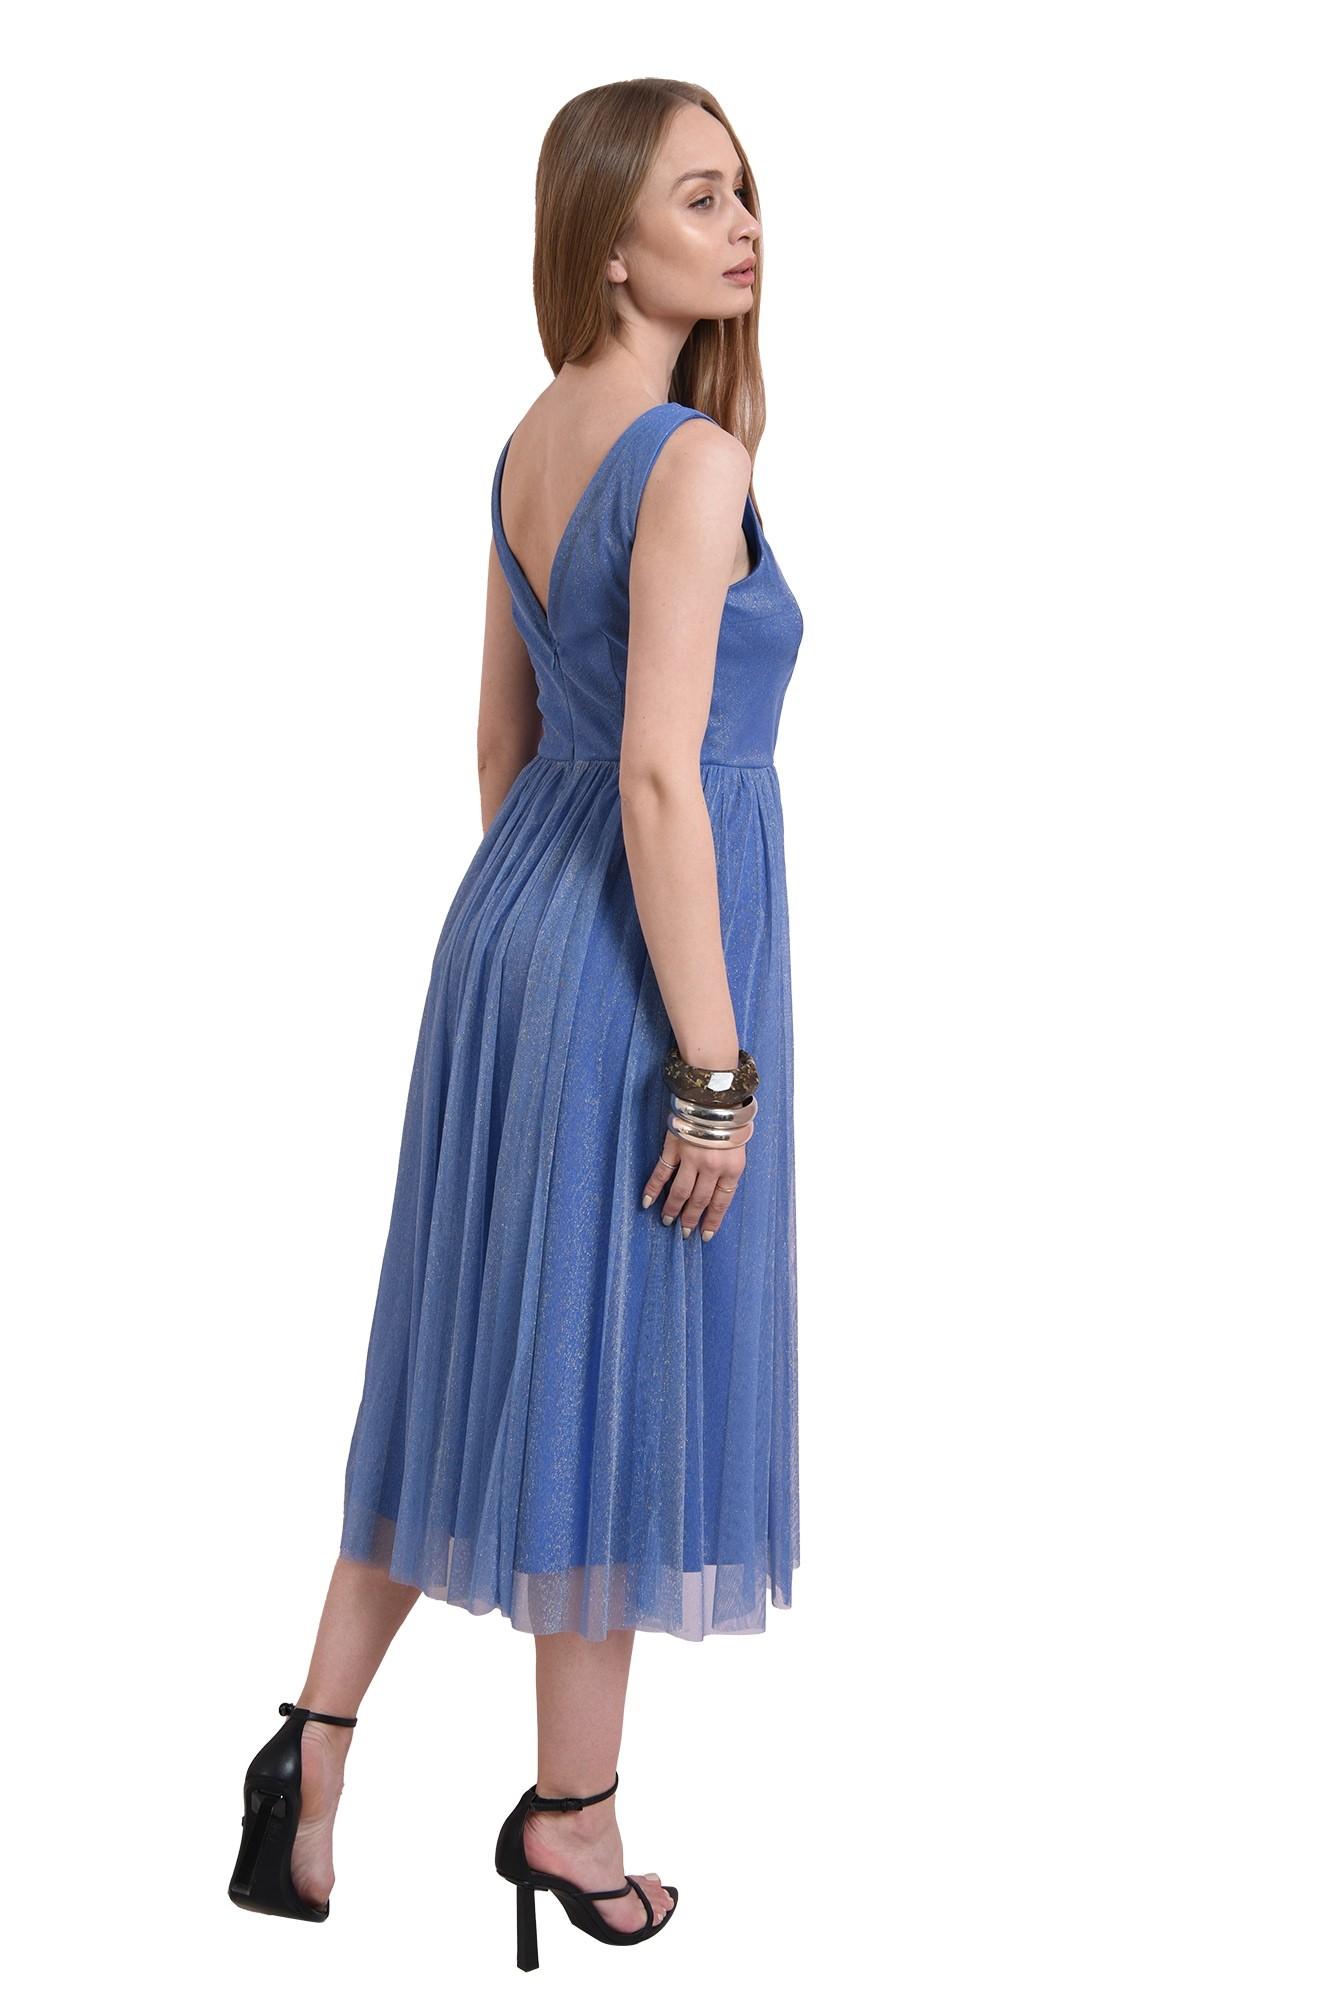 3 - rochie eleganta, bleu, Poema